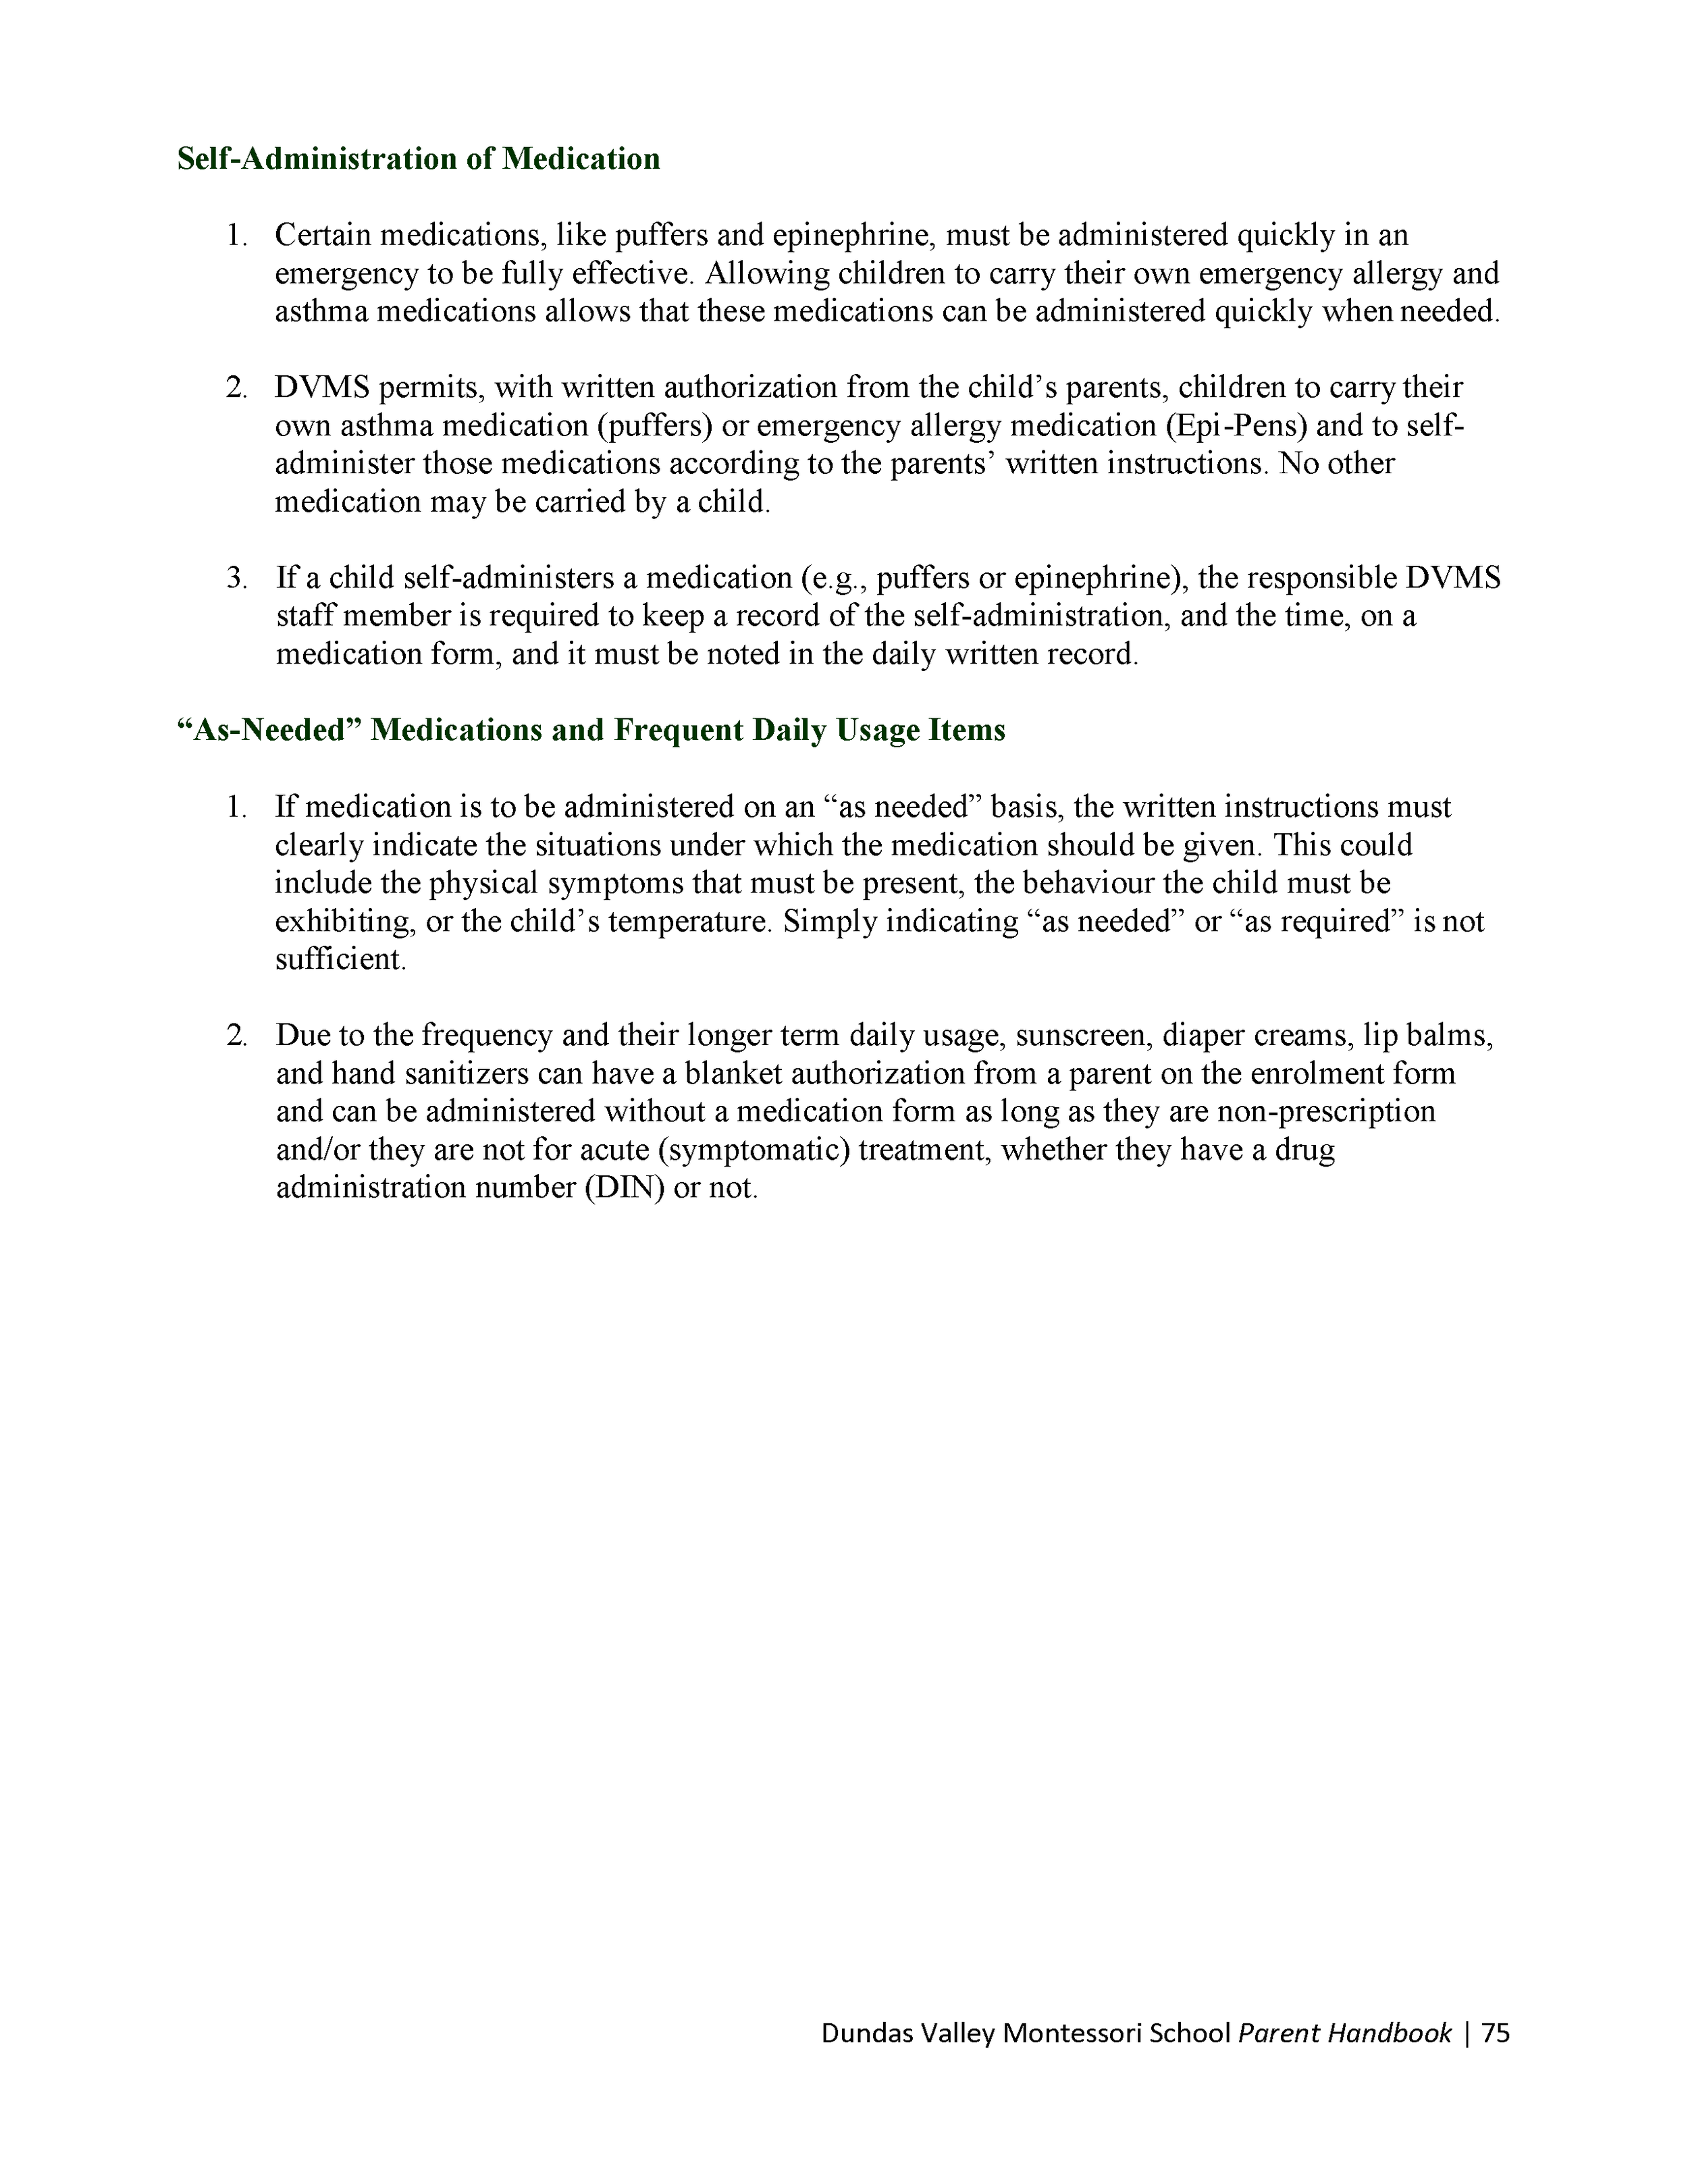 DVMS-Parent-Handbook-19-20_Page_077.png